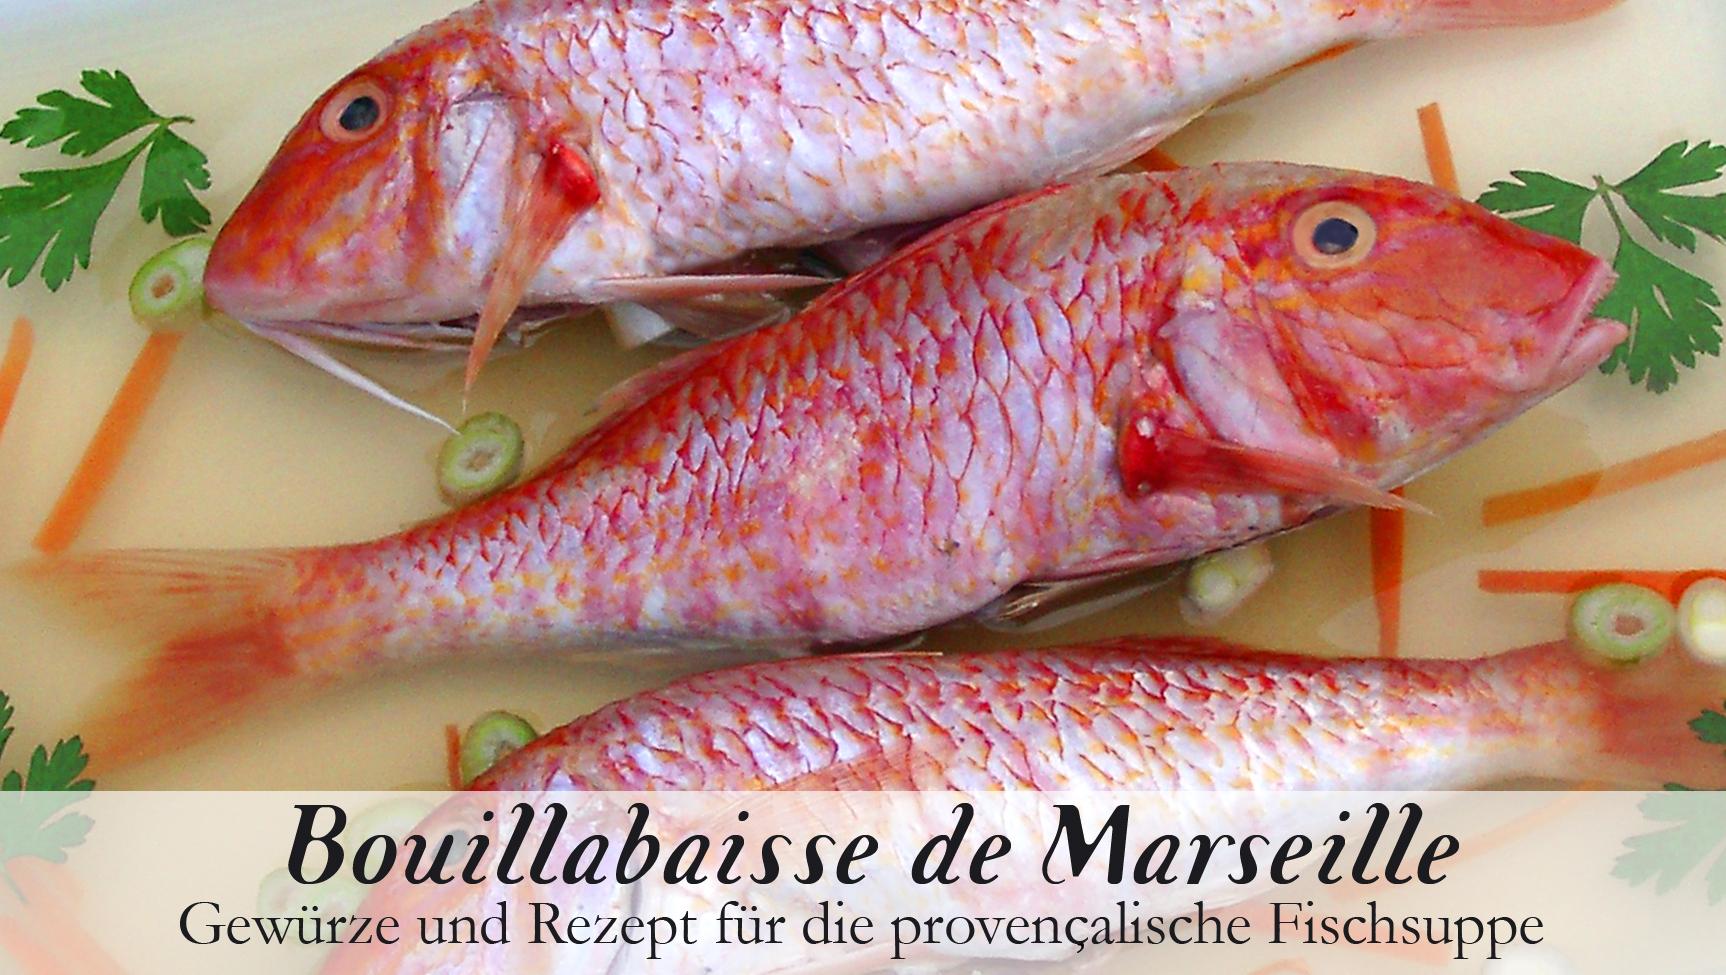 Bouillabaisse de Marseille